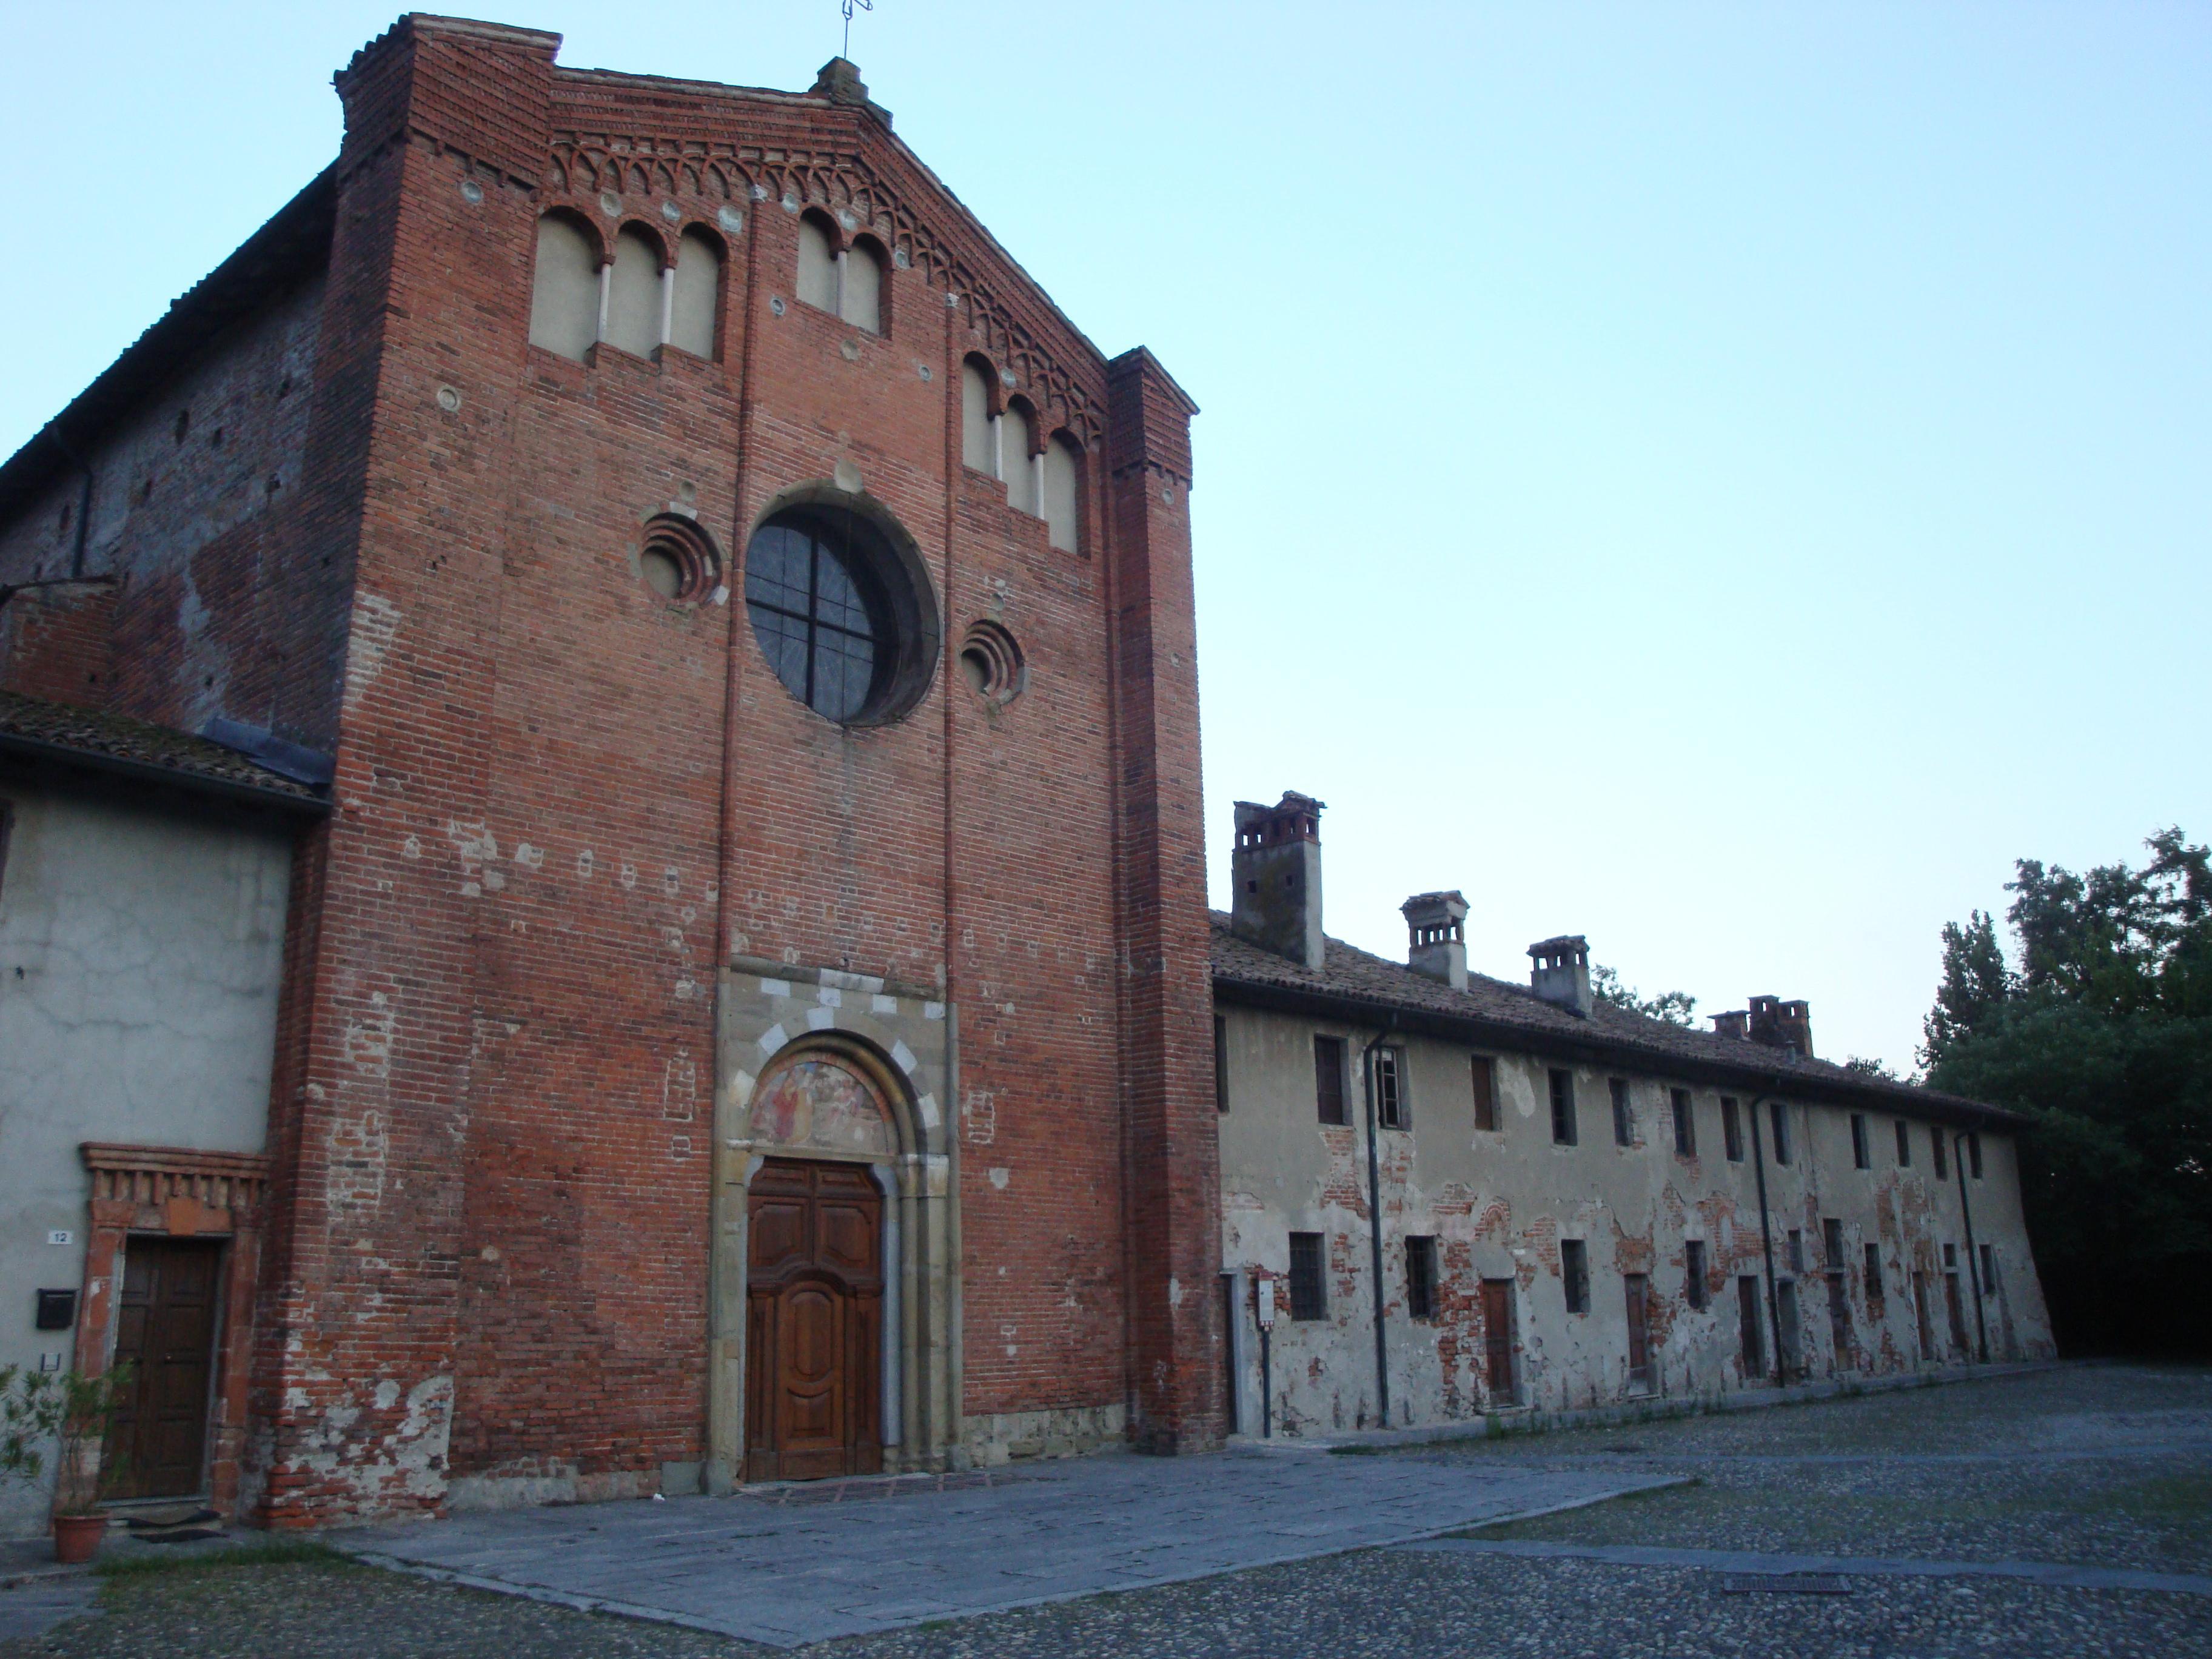 22 novembre – Visita guidata a San Lanfranco